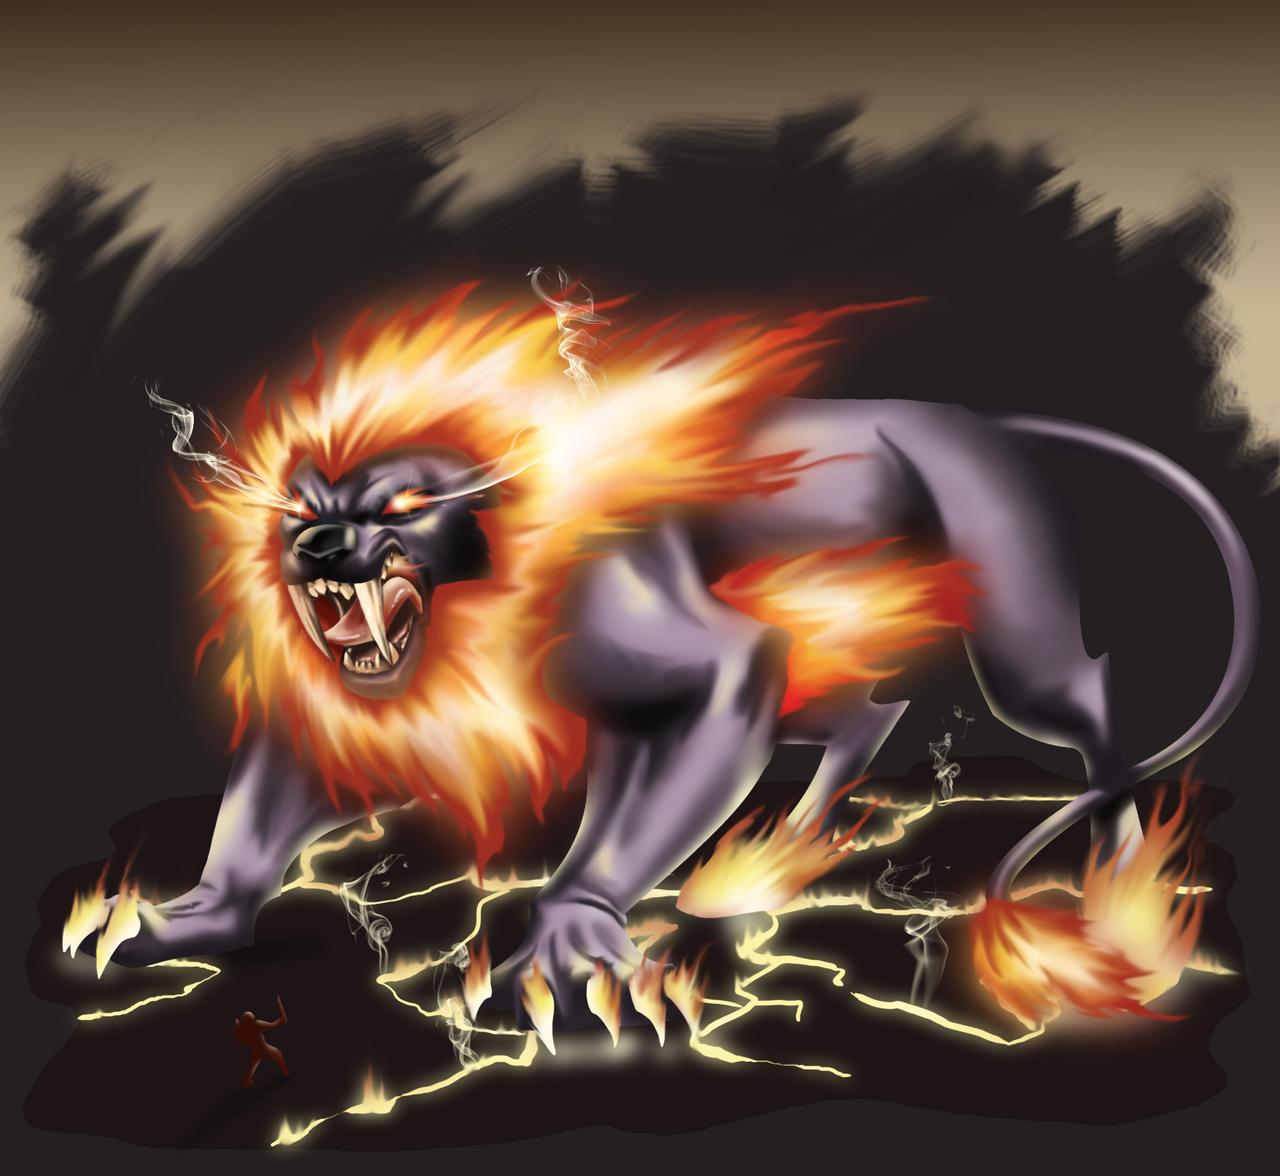 RIFT fire colossus by aerlixir